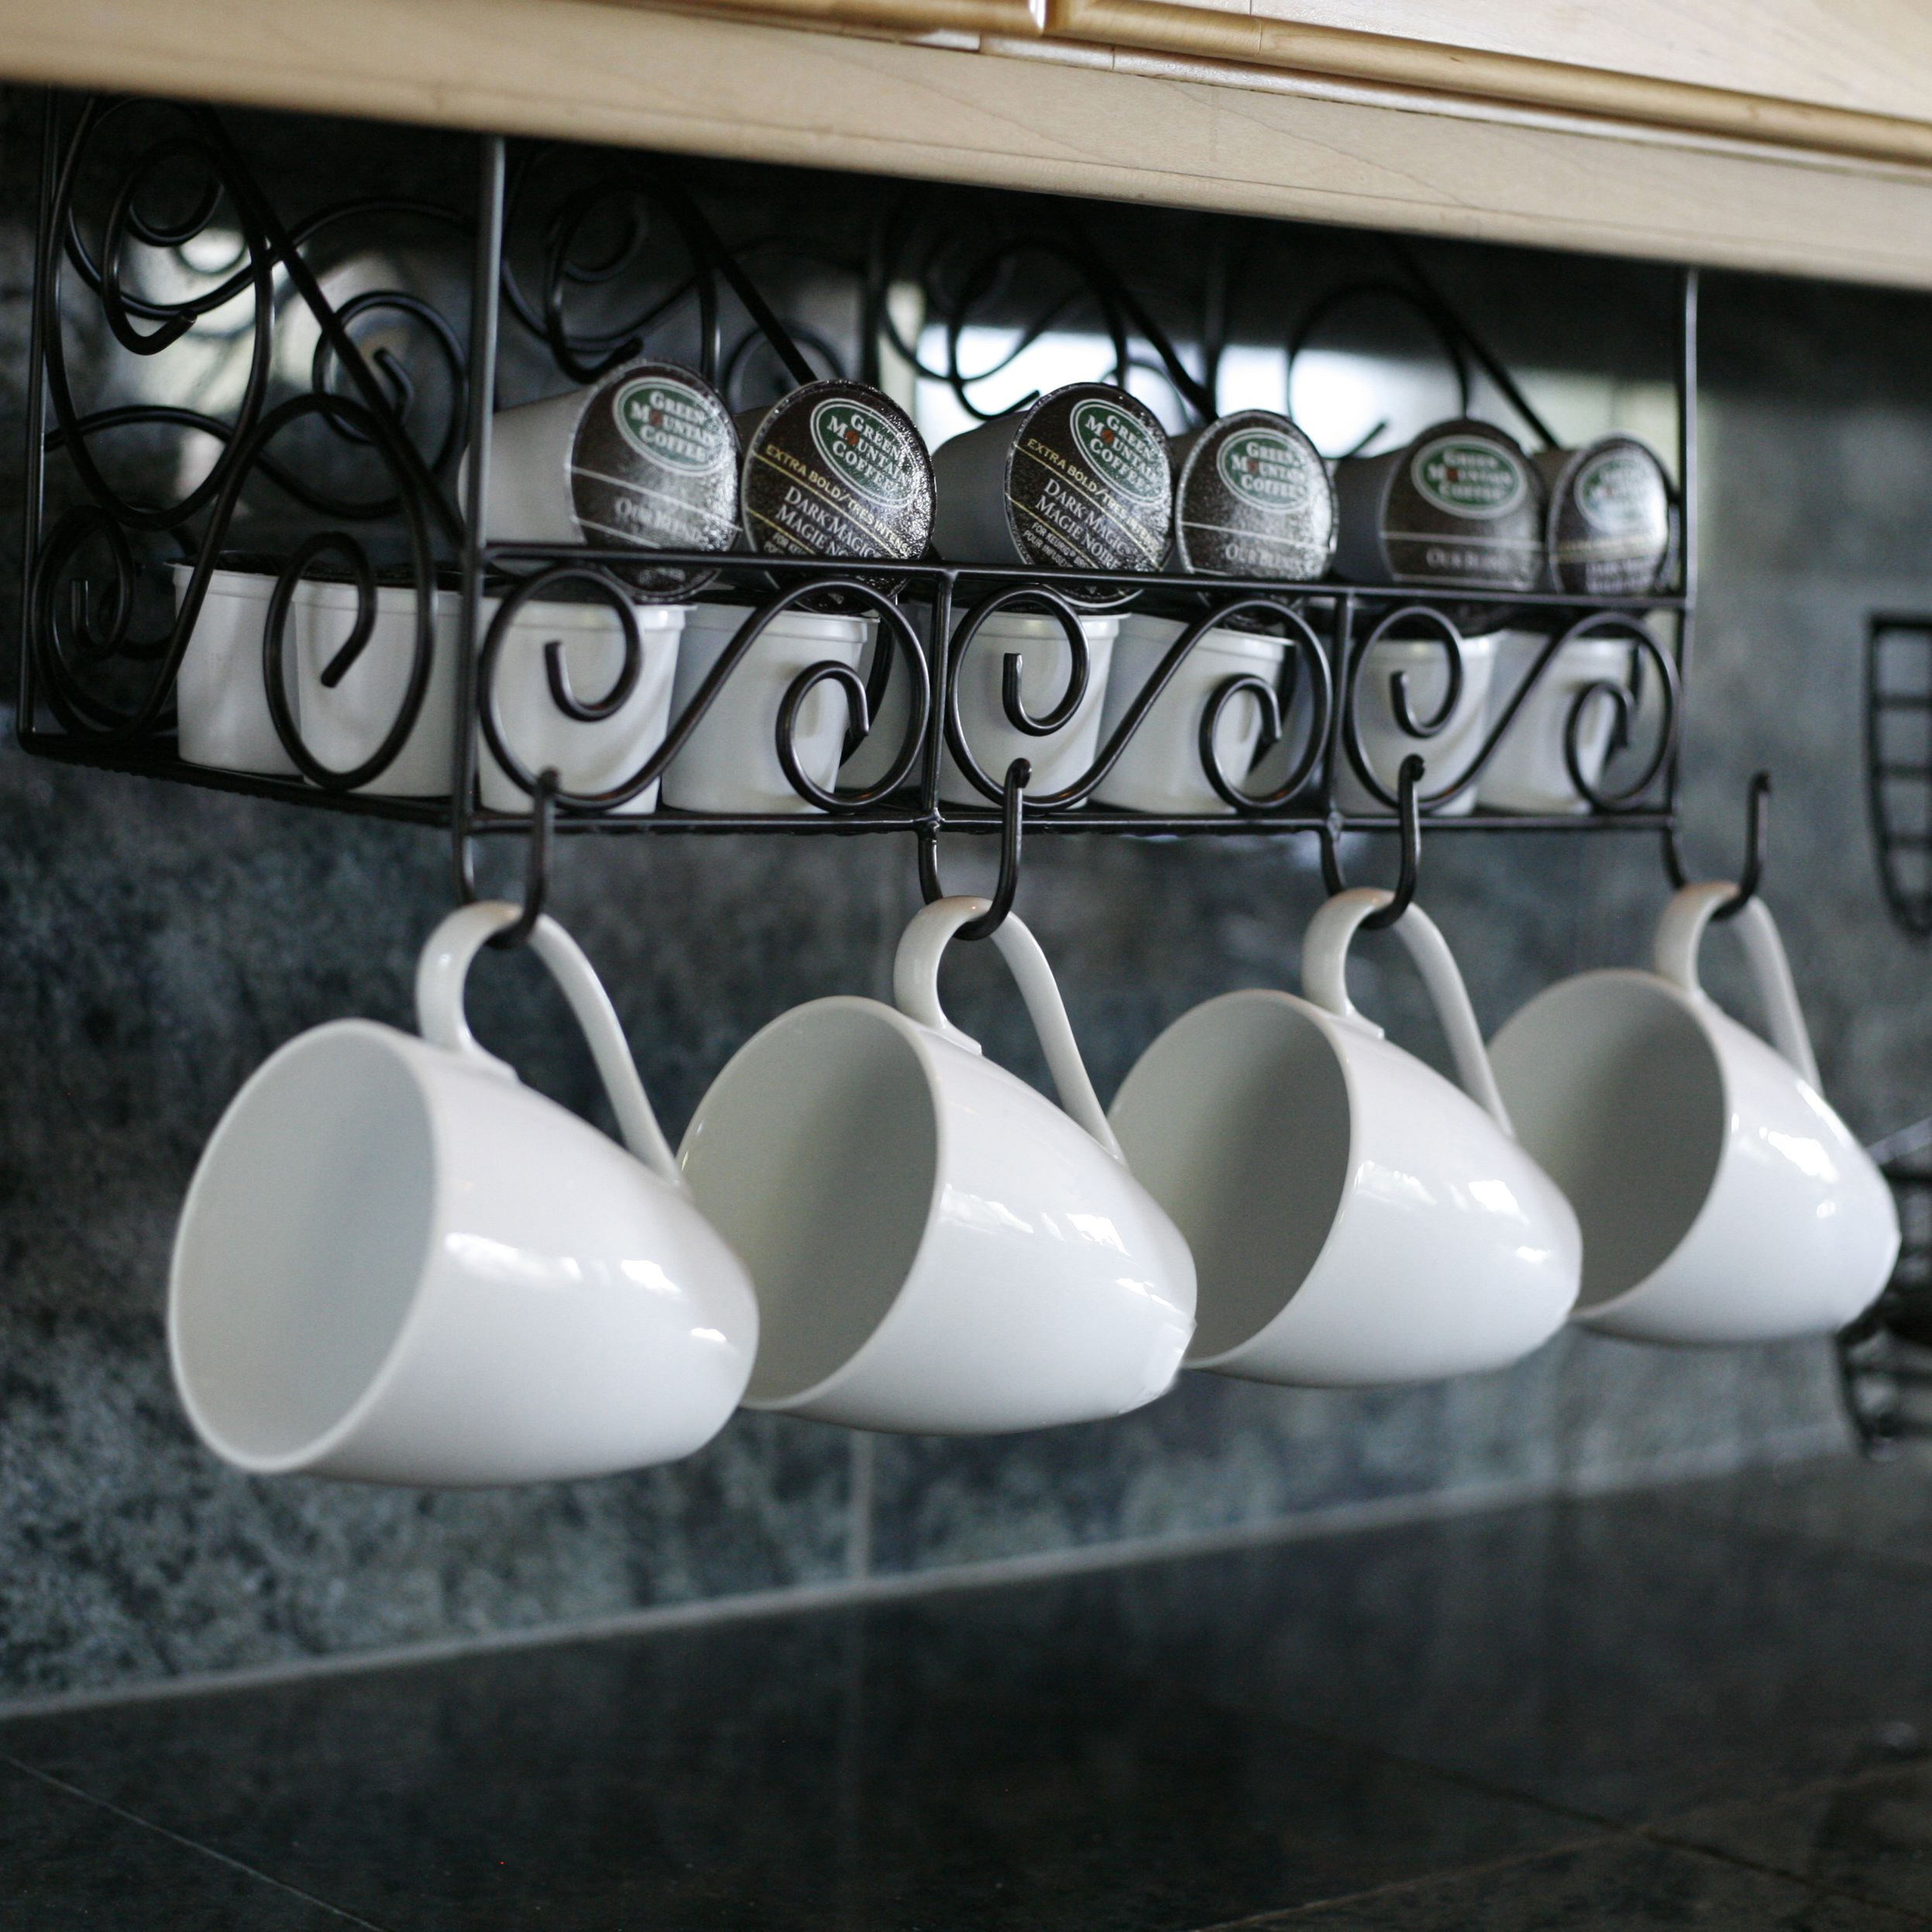 Shelf Holder And Coffee Mugs Hanging